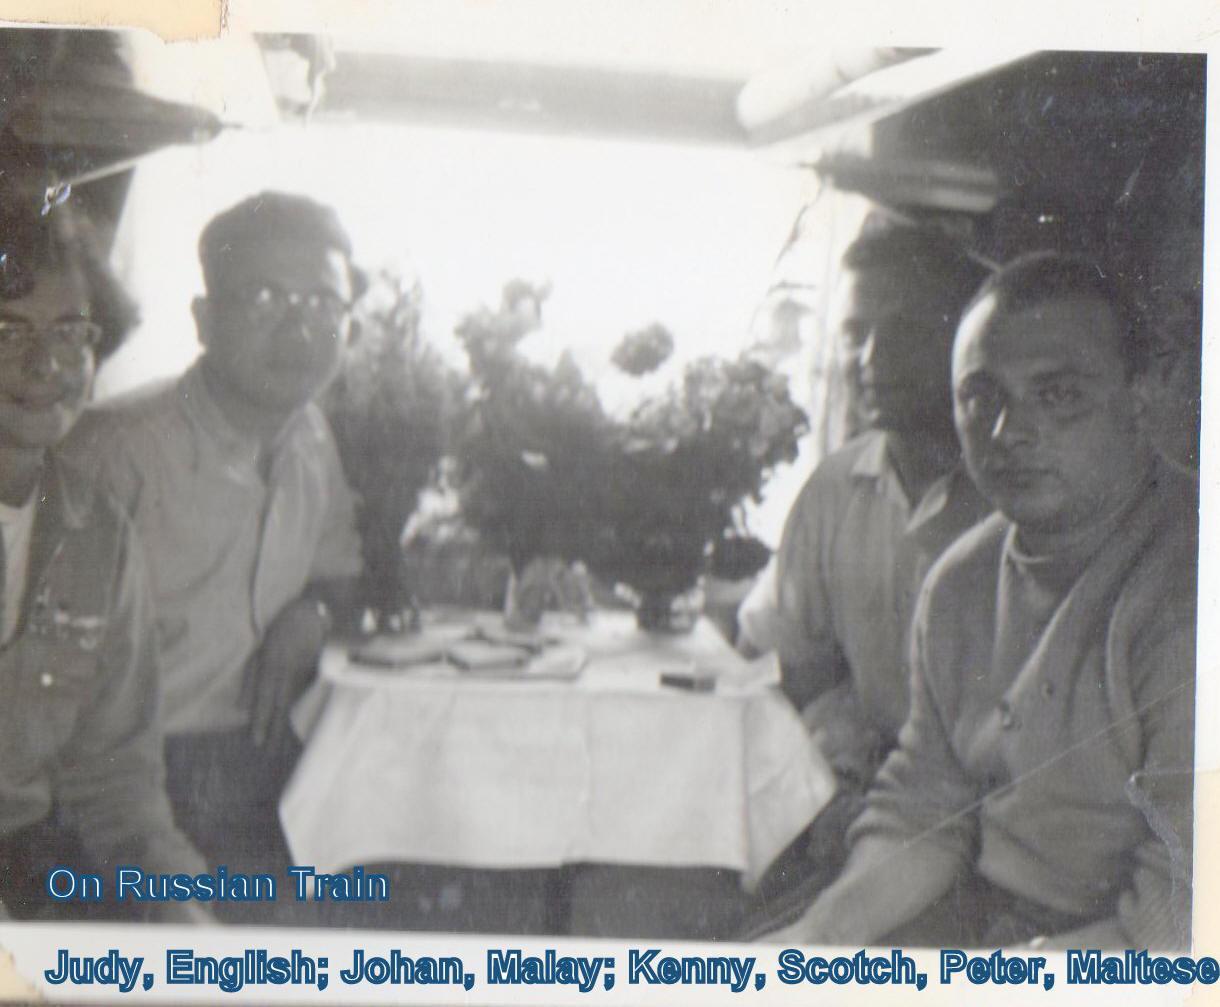 Judy (England), John (Malay), Kenny (Scotland),  Peter (Malay)